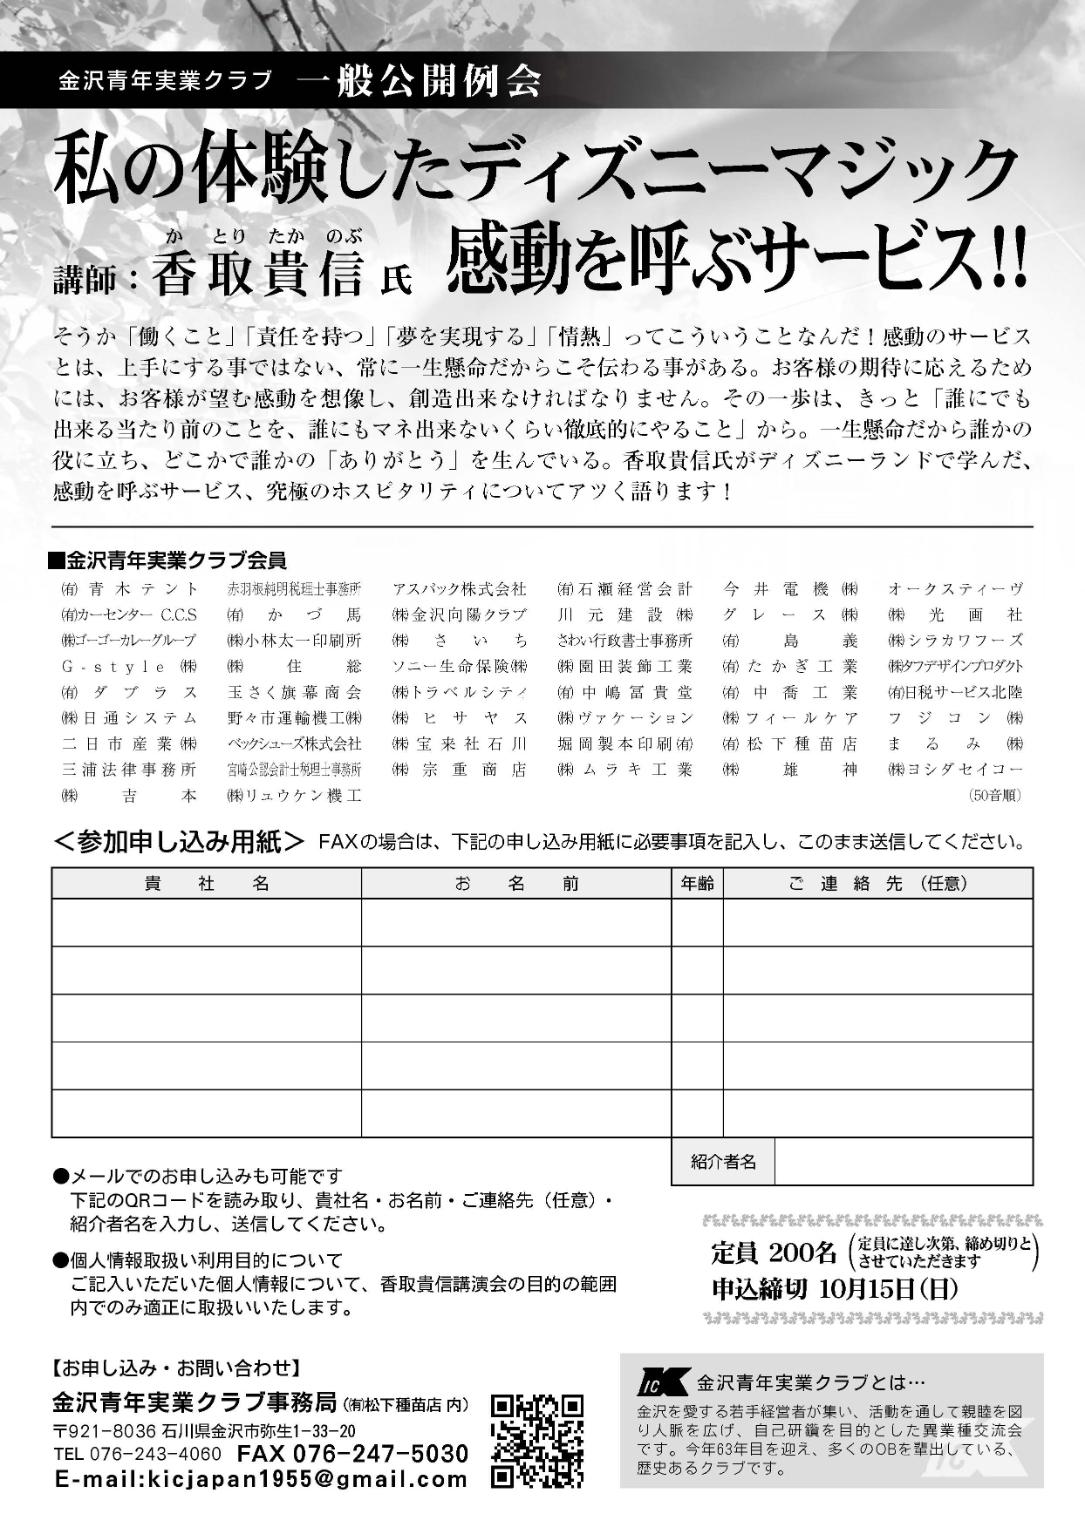 香取貴信/一般公開講演会/ウラ